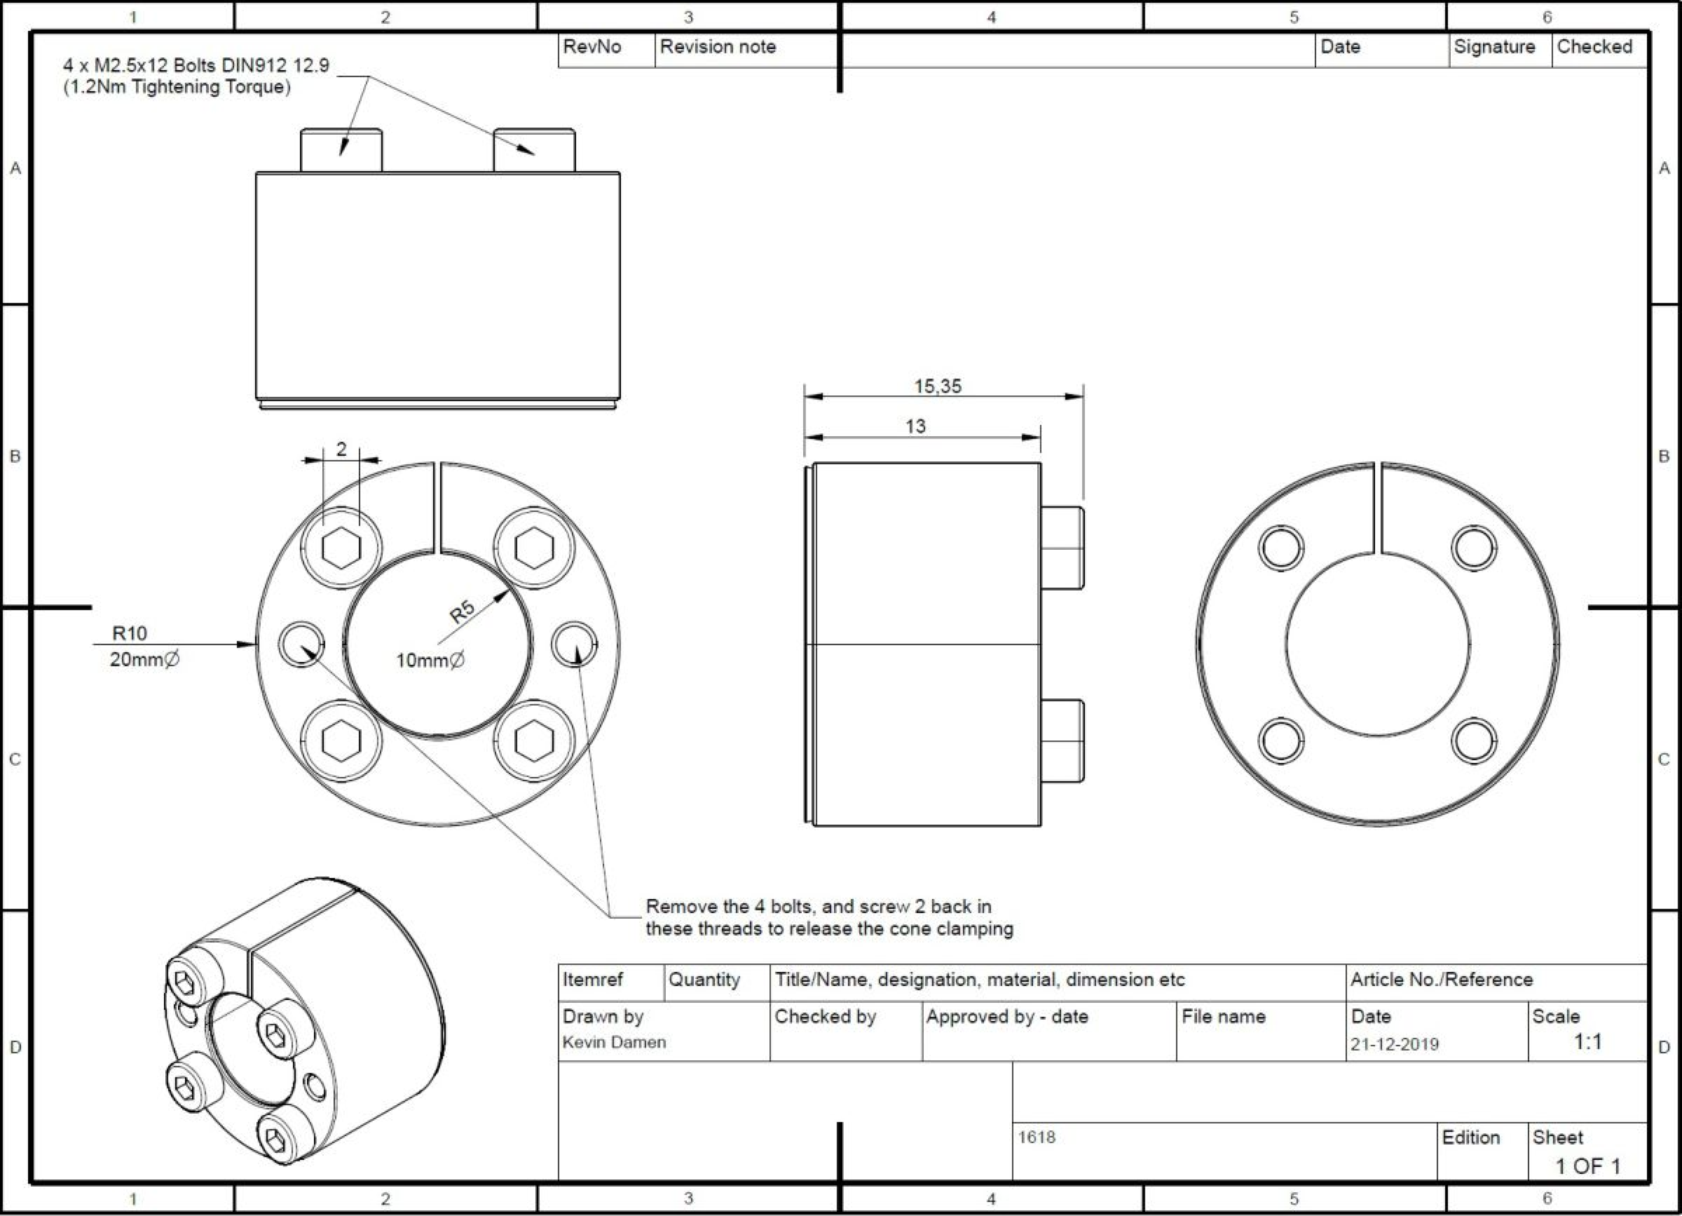 16182 locking assembly bk61 dxd 10x20 lt16 2d dimensions